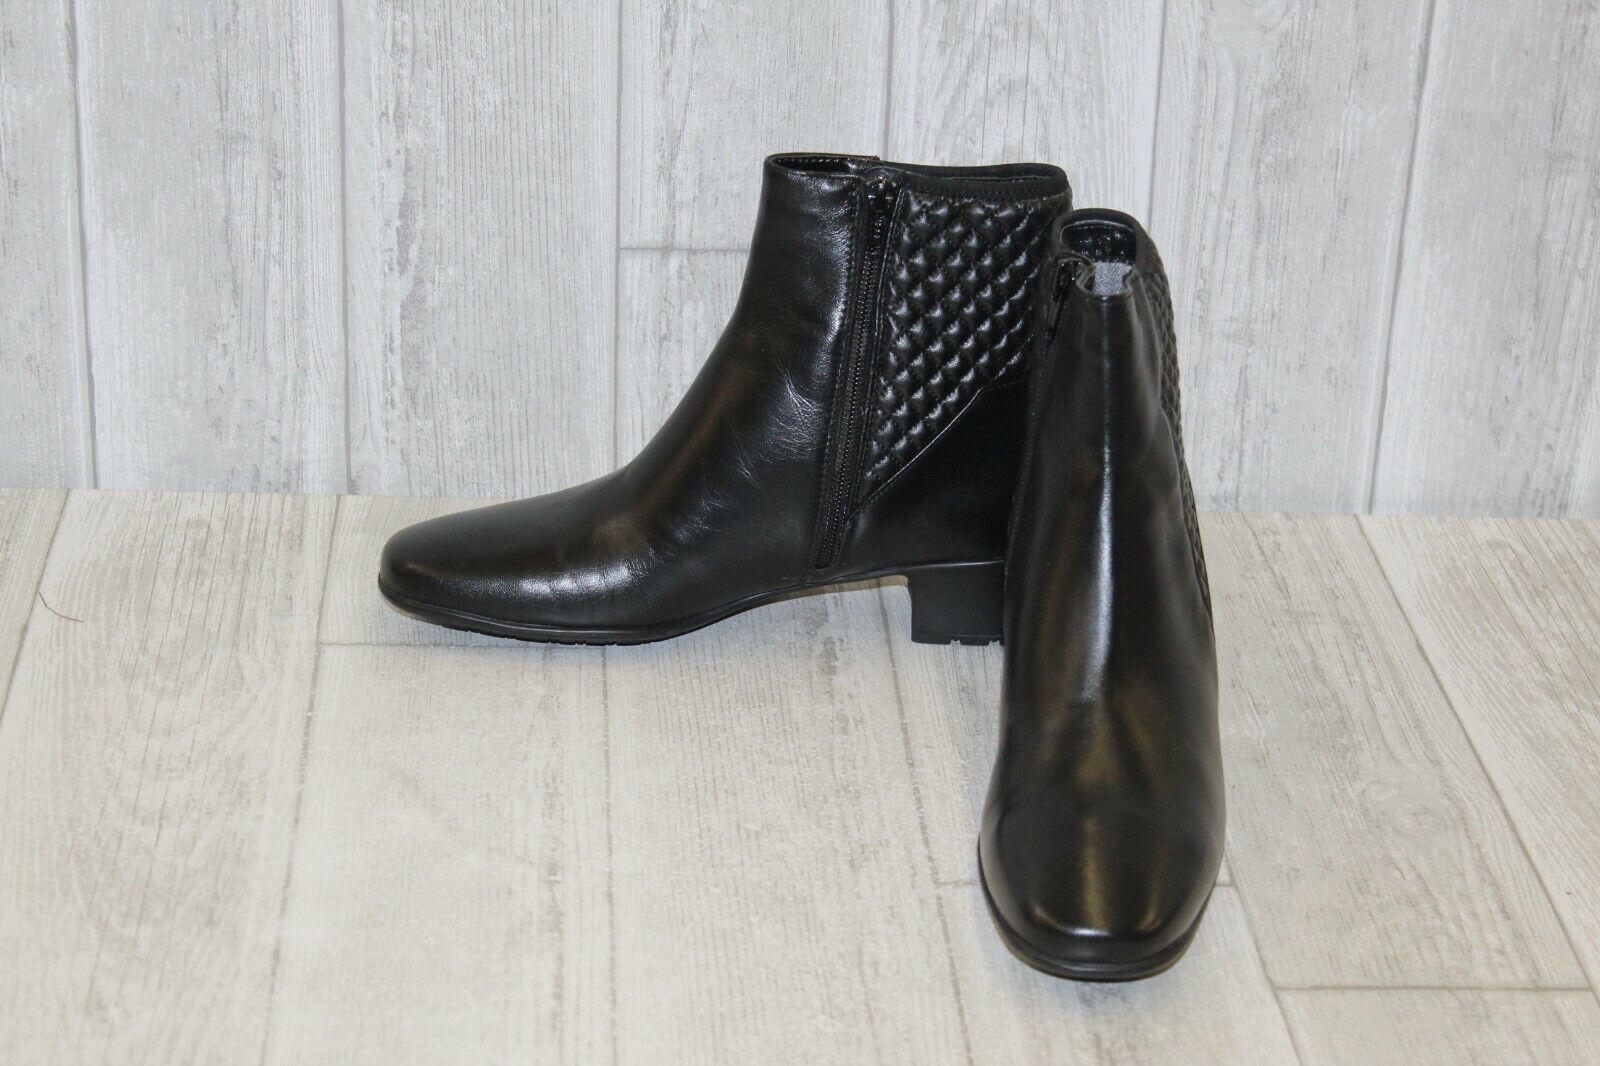 Sesto Meucci Yogita Waterproof Leather Booties, Women's Size Size Size 7.5, Black NEW 8a4acf